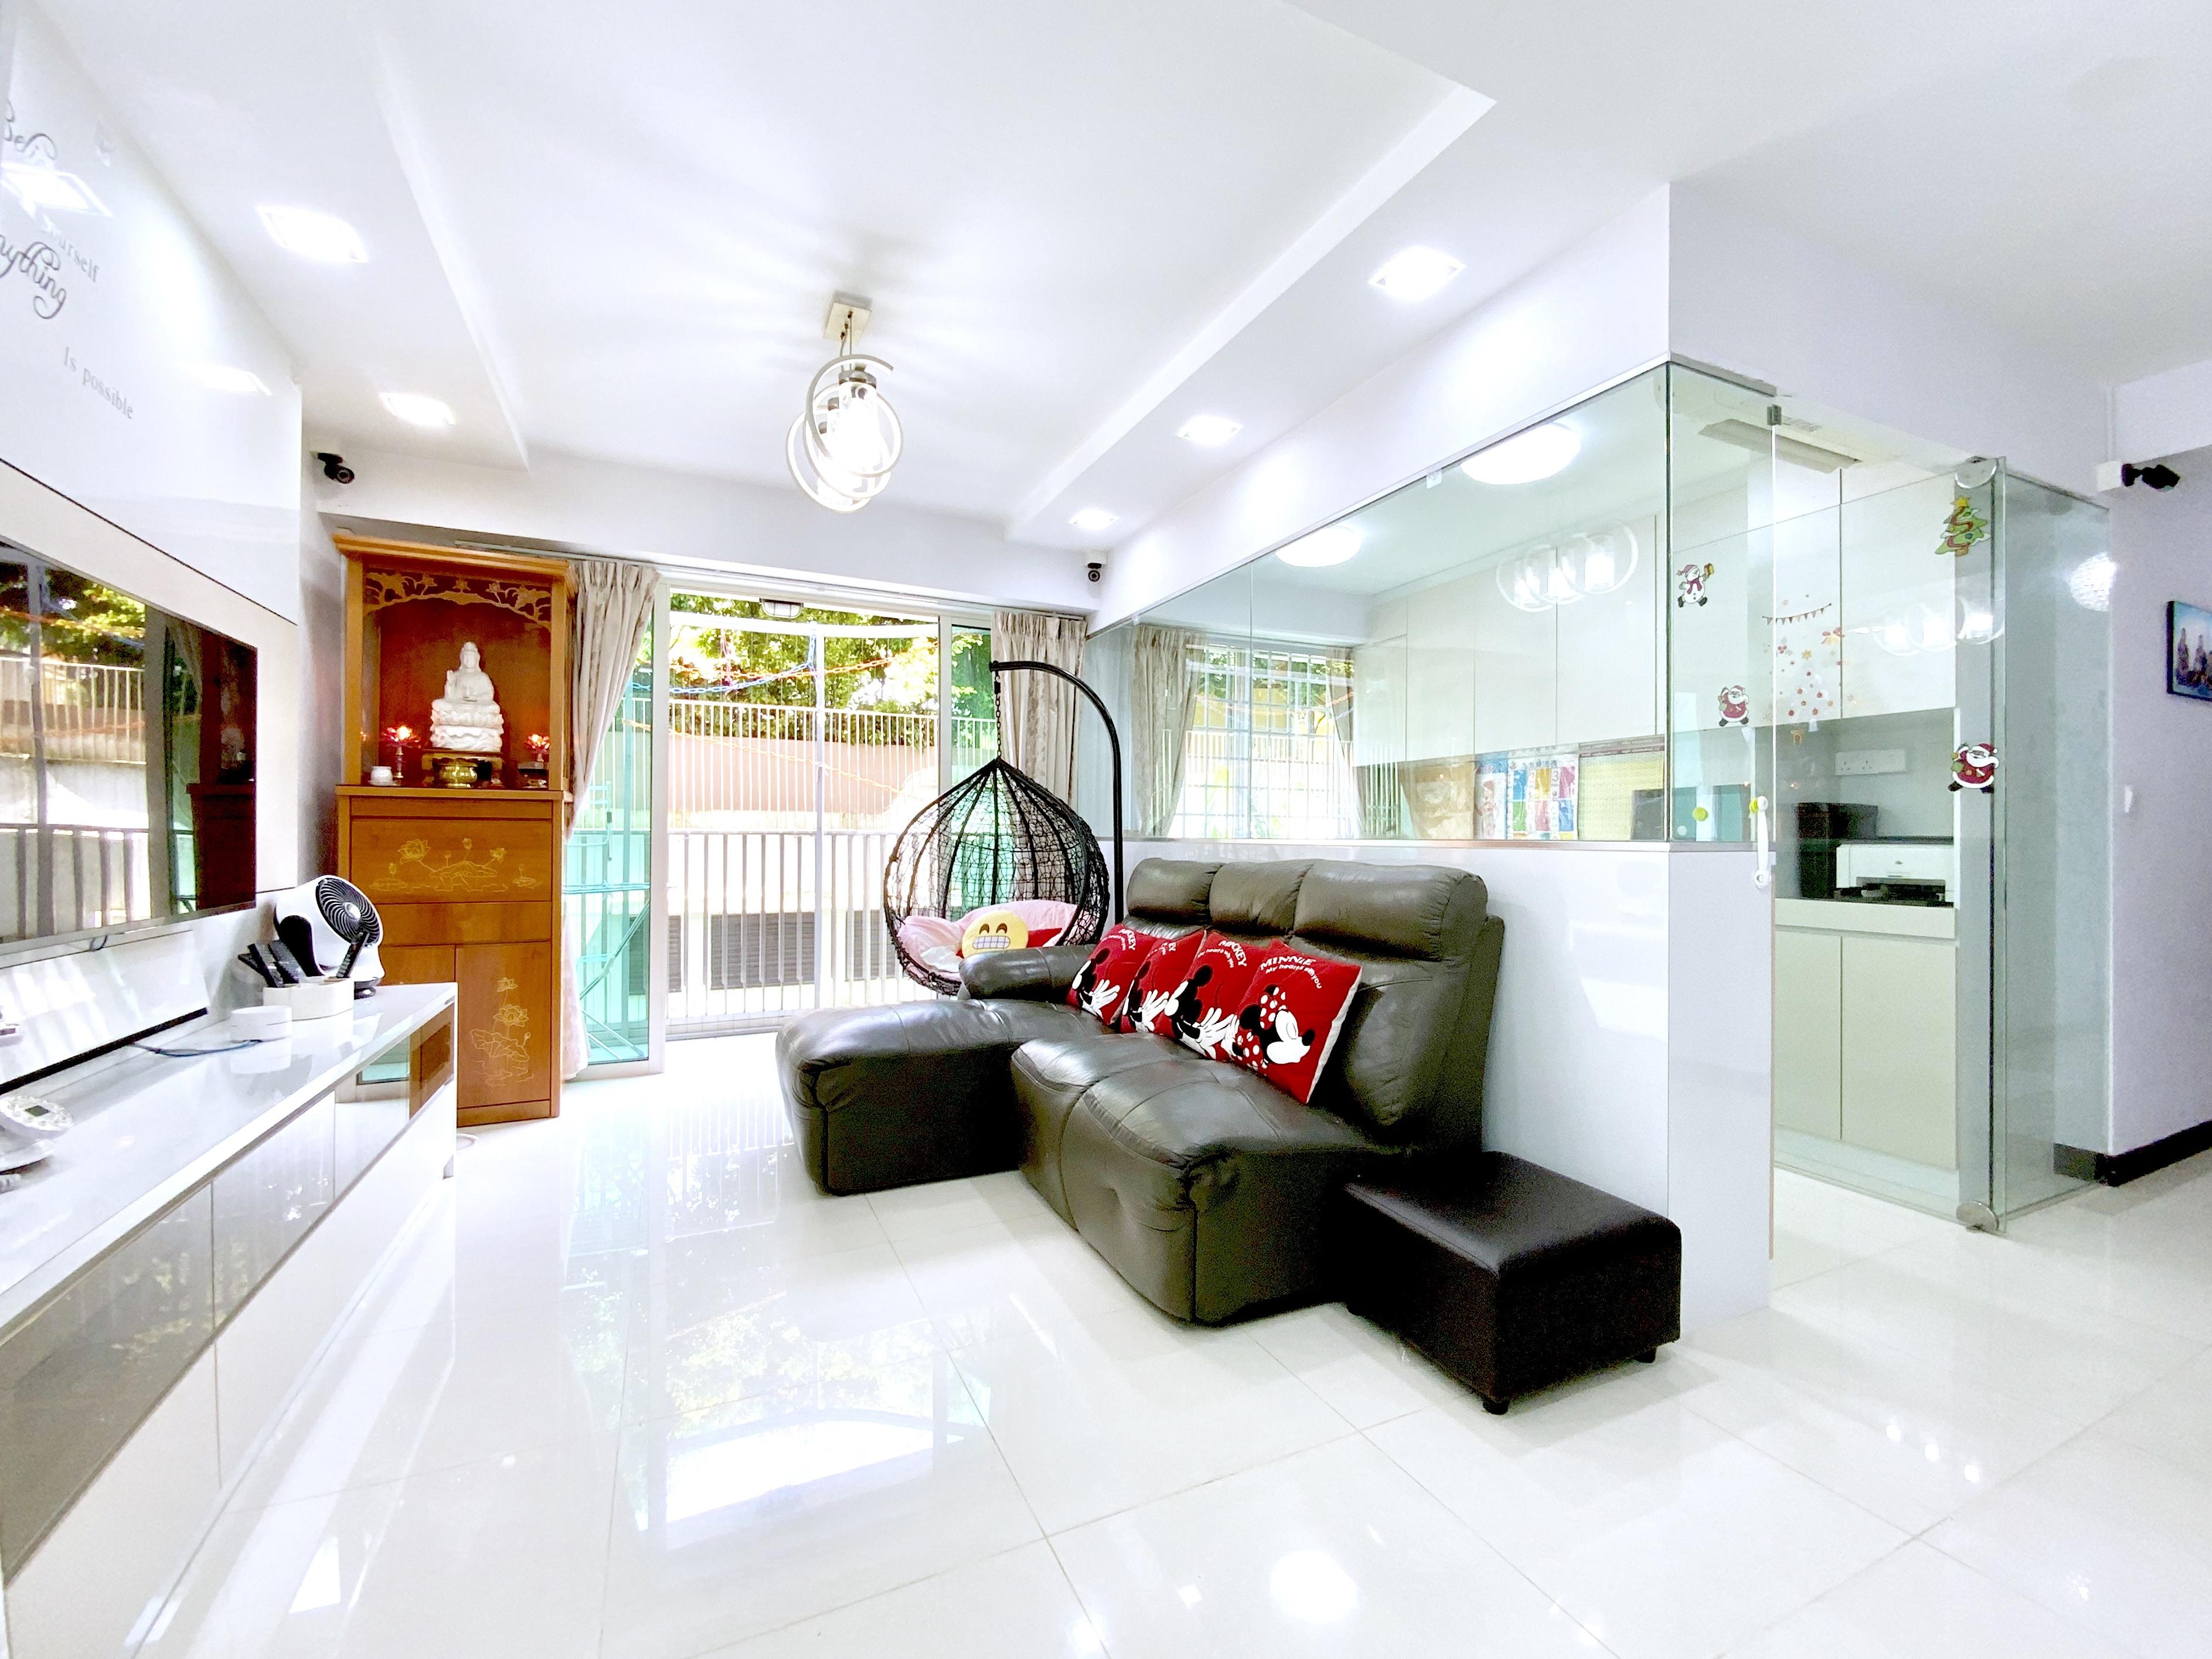 194B Bukit Batok West Avenue 6 #129536278